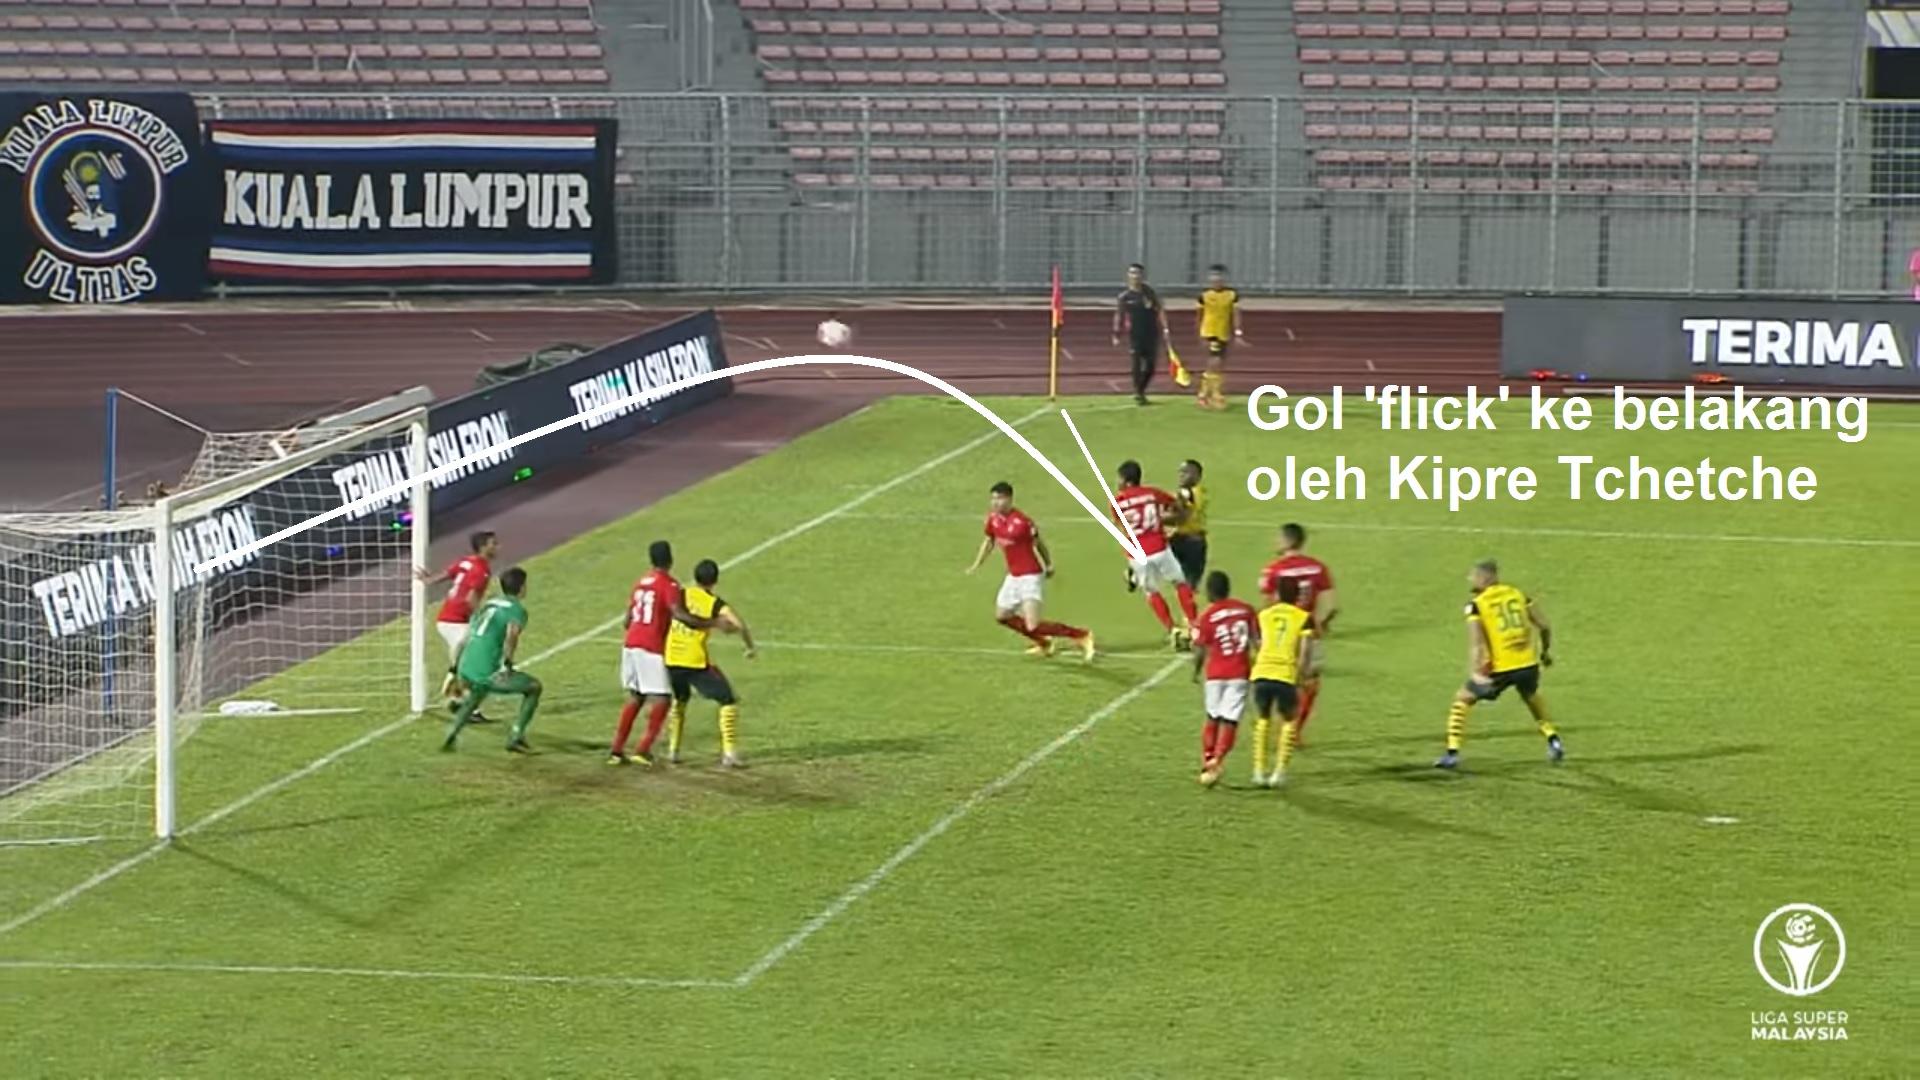 Kipre Tchetche gol pelik kata Bojan Hodak gembira